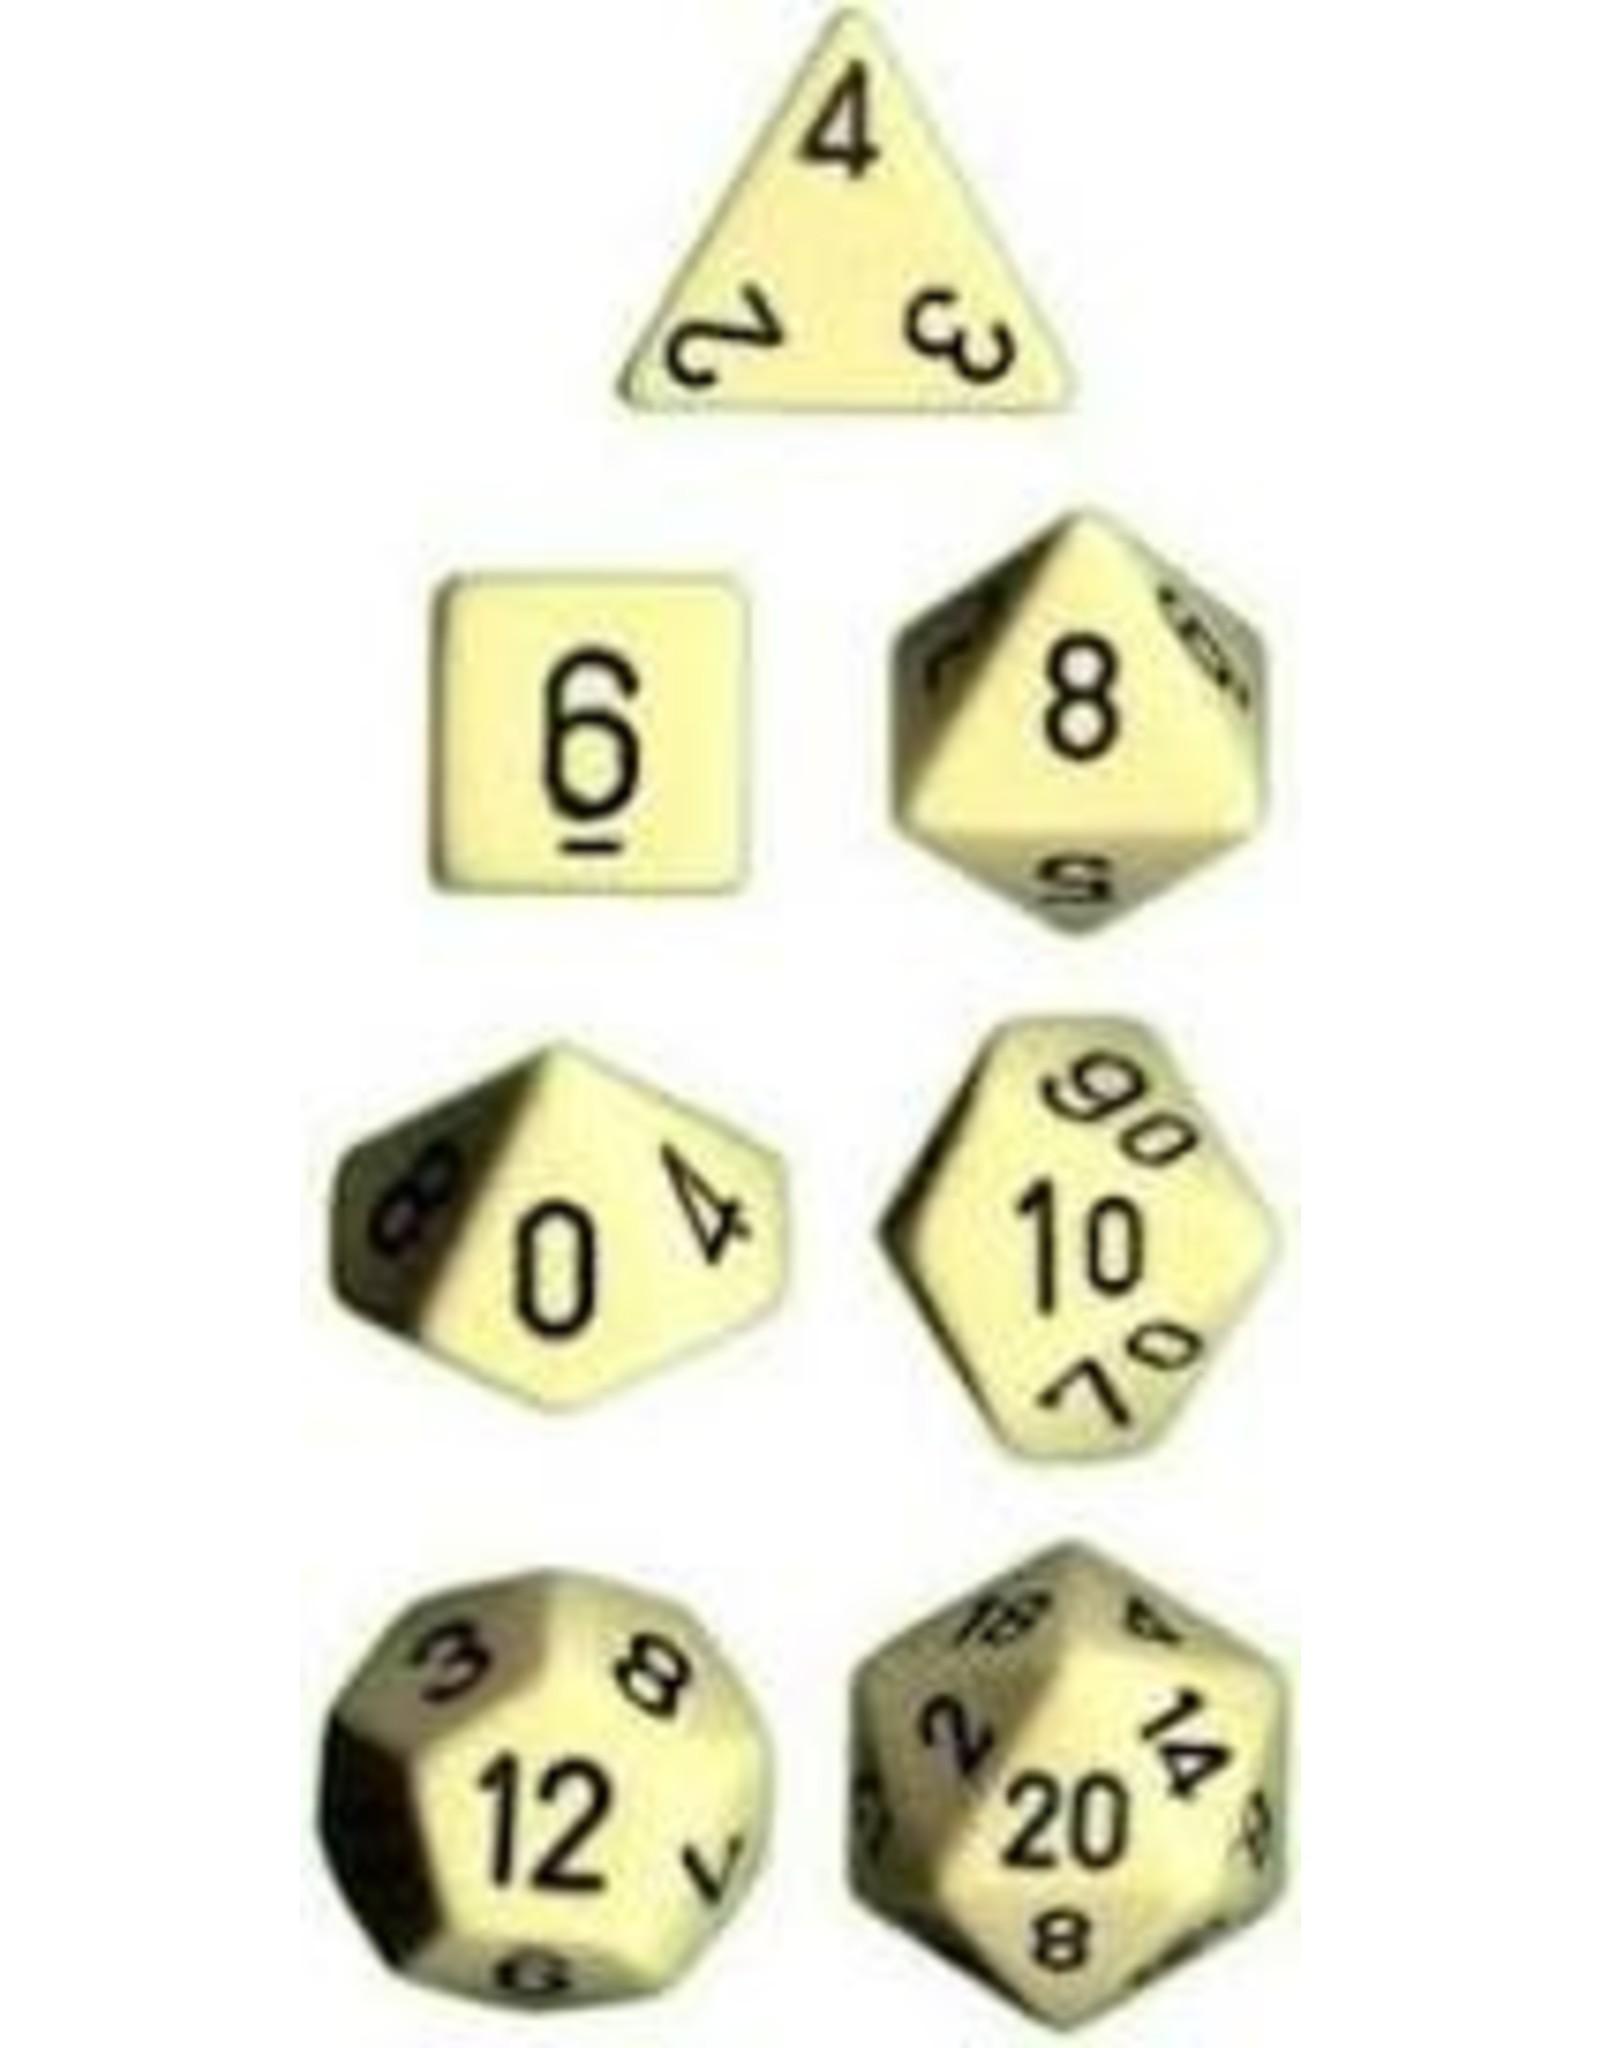 Chessex 7-setCubeOP IVbk